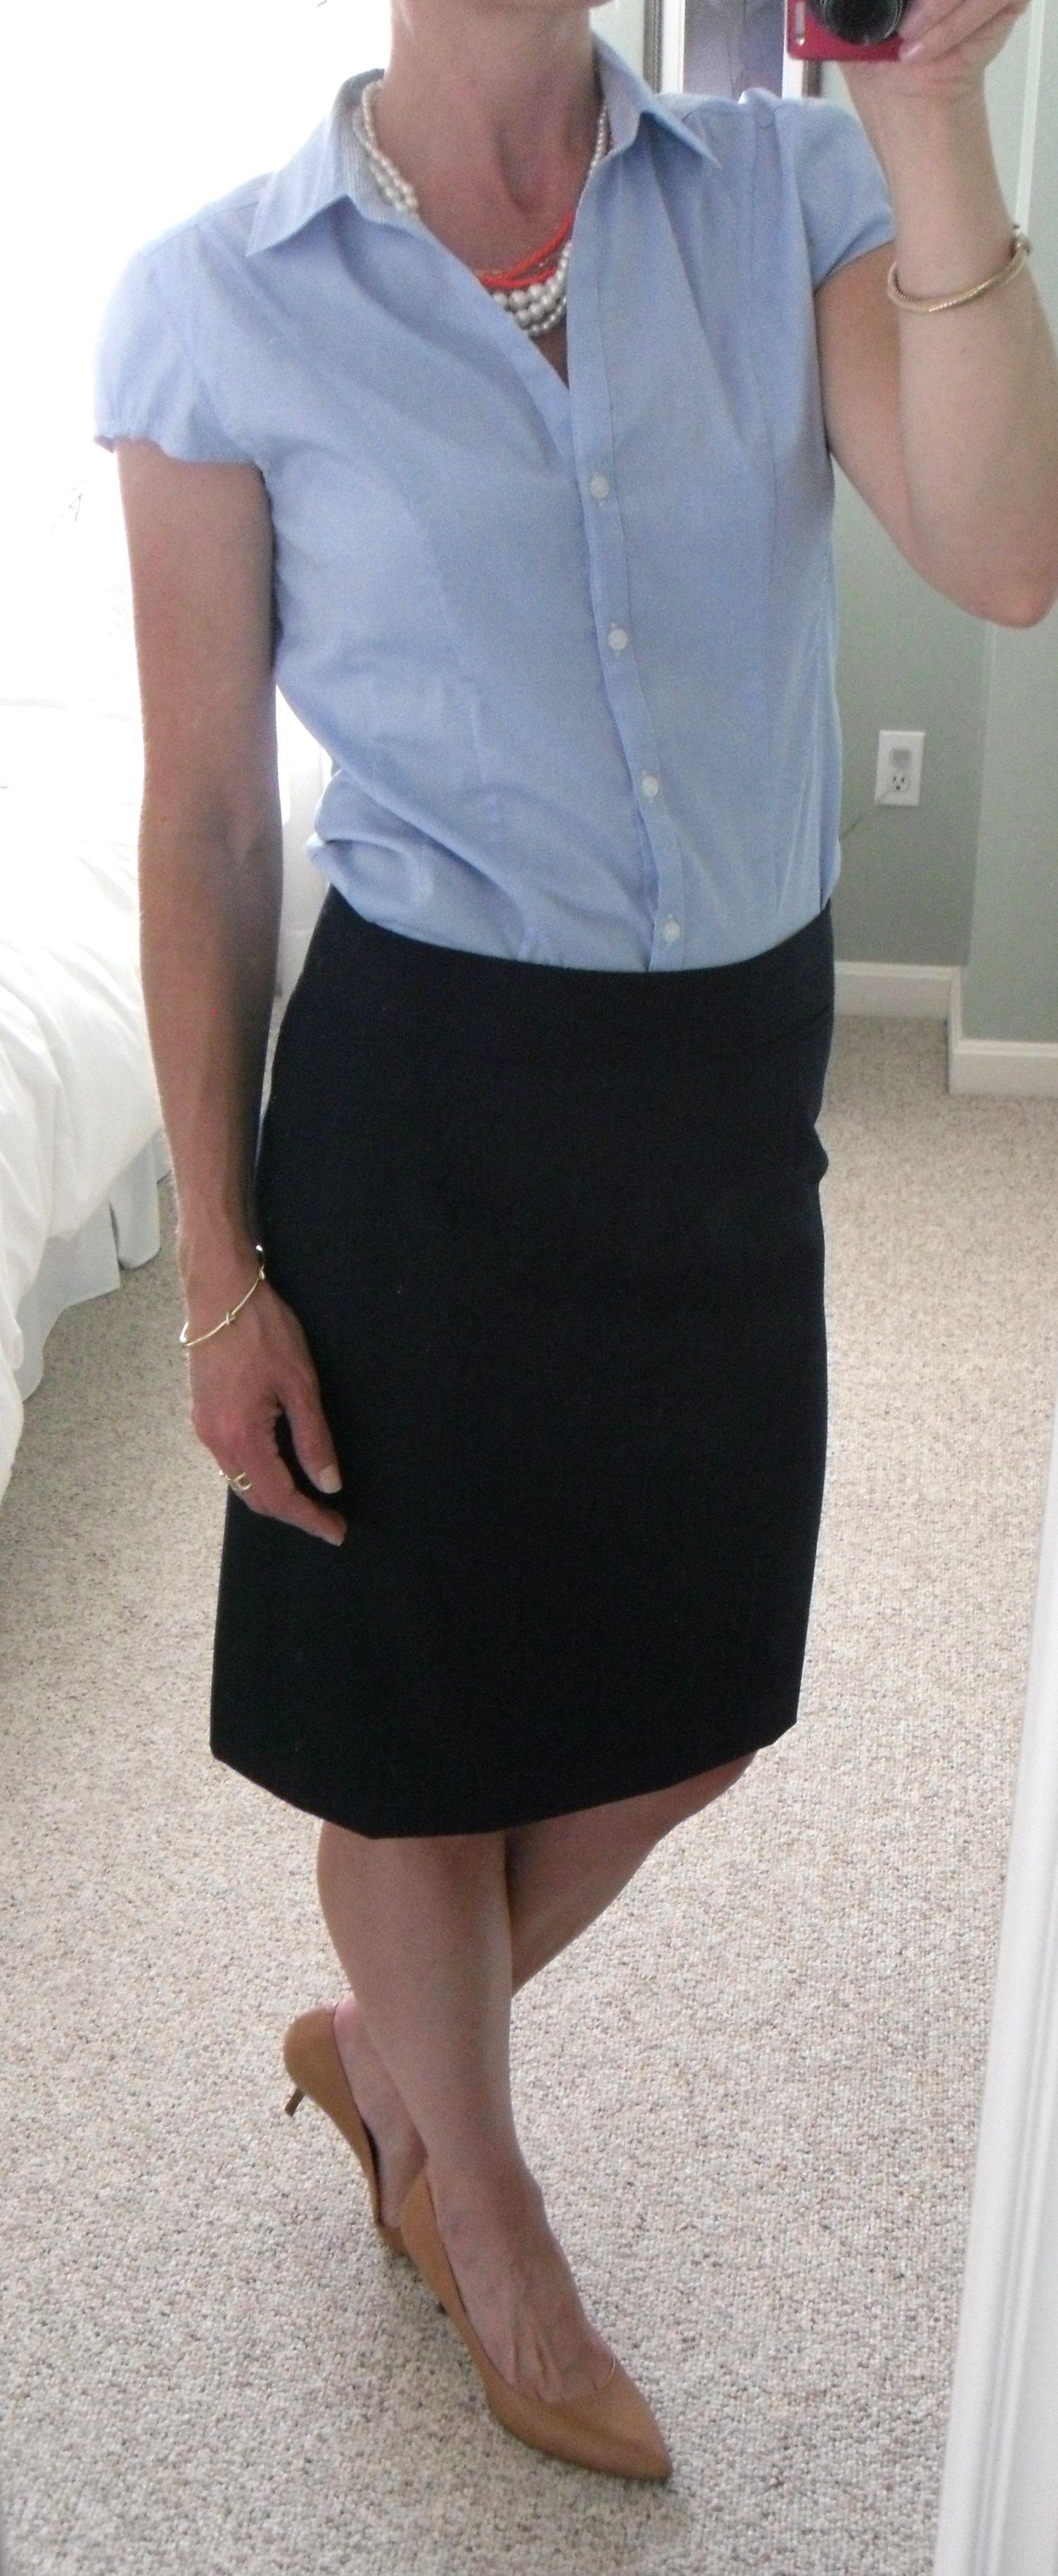 Navy short blue pencil skirt catalog photo